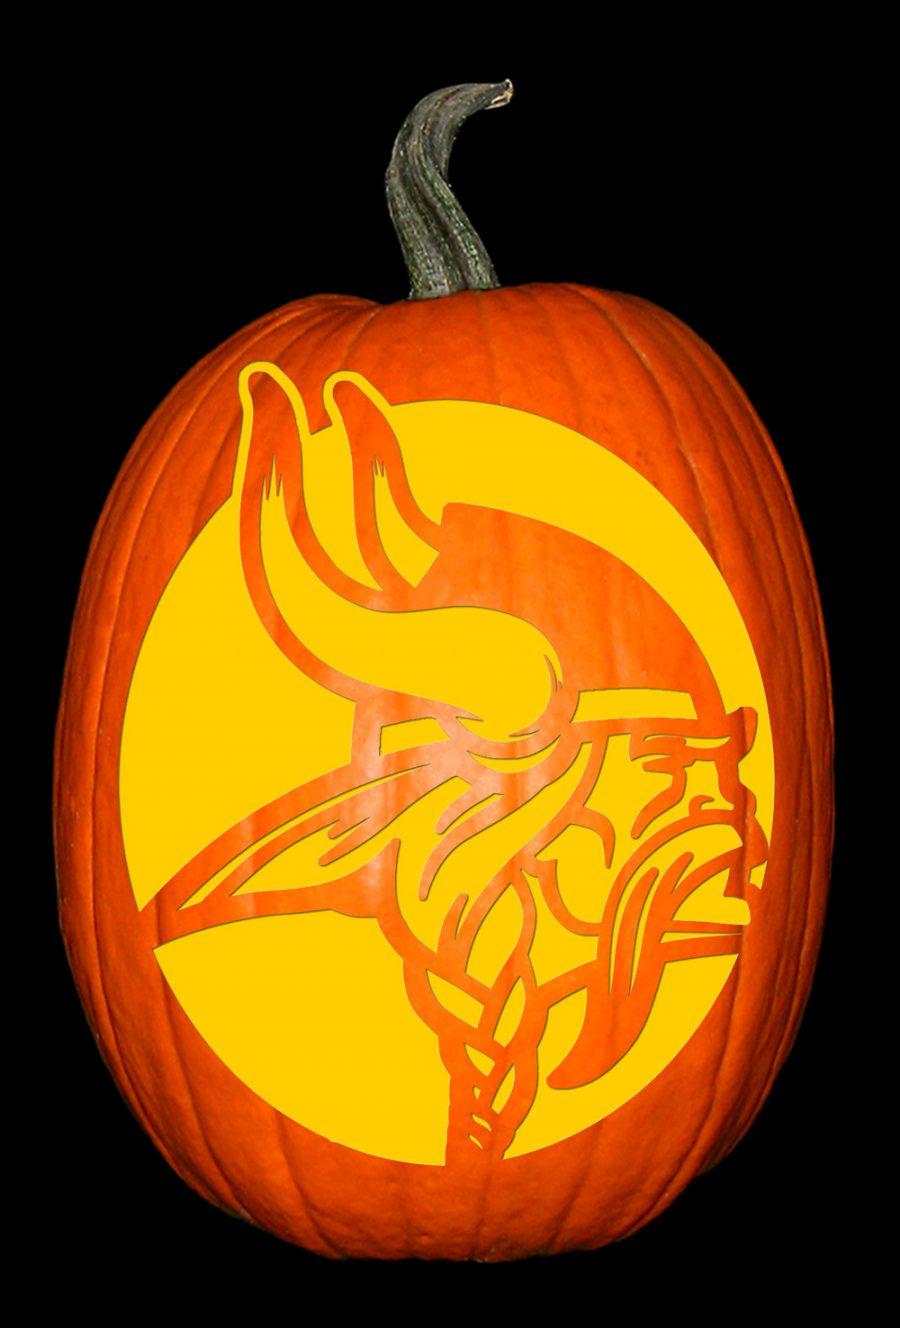 Minnesota Vikings Pumpkin